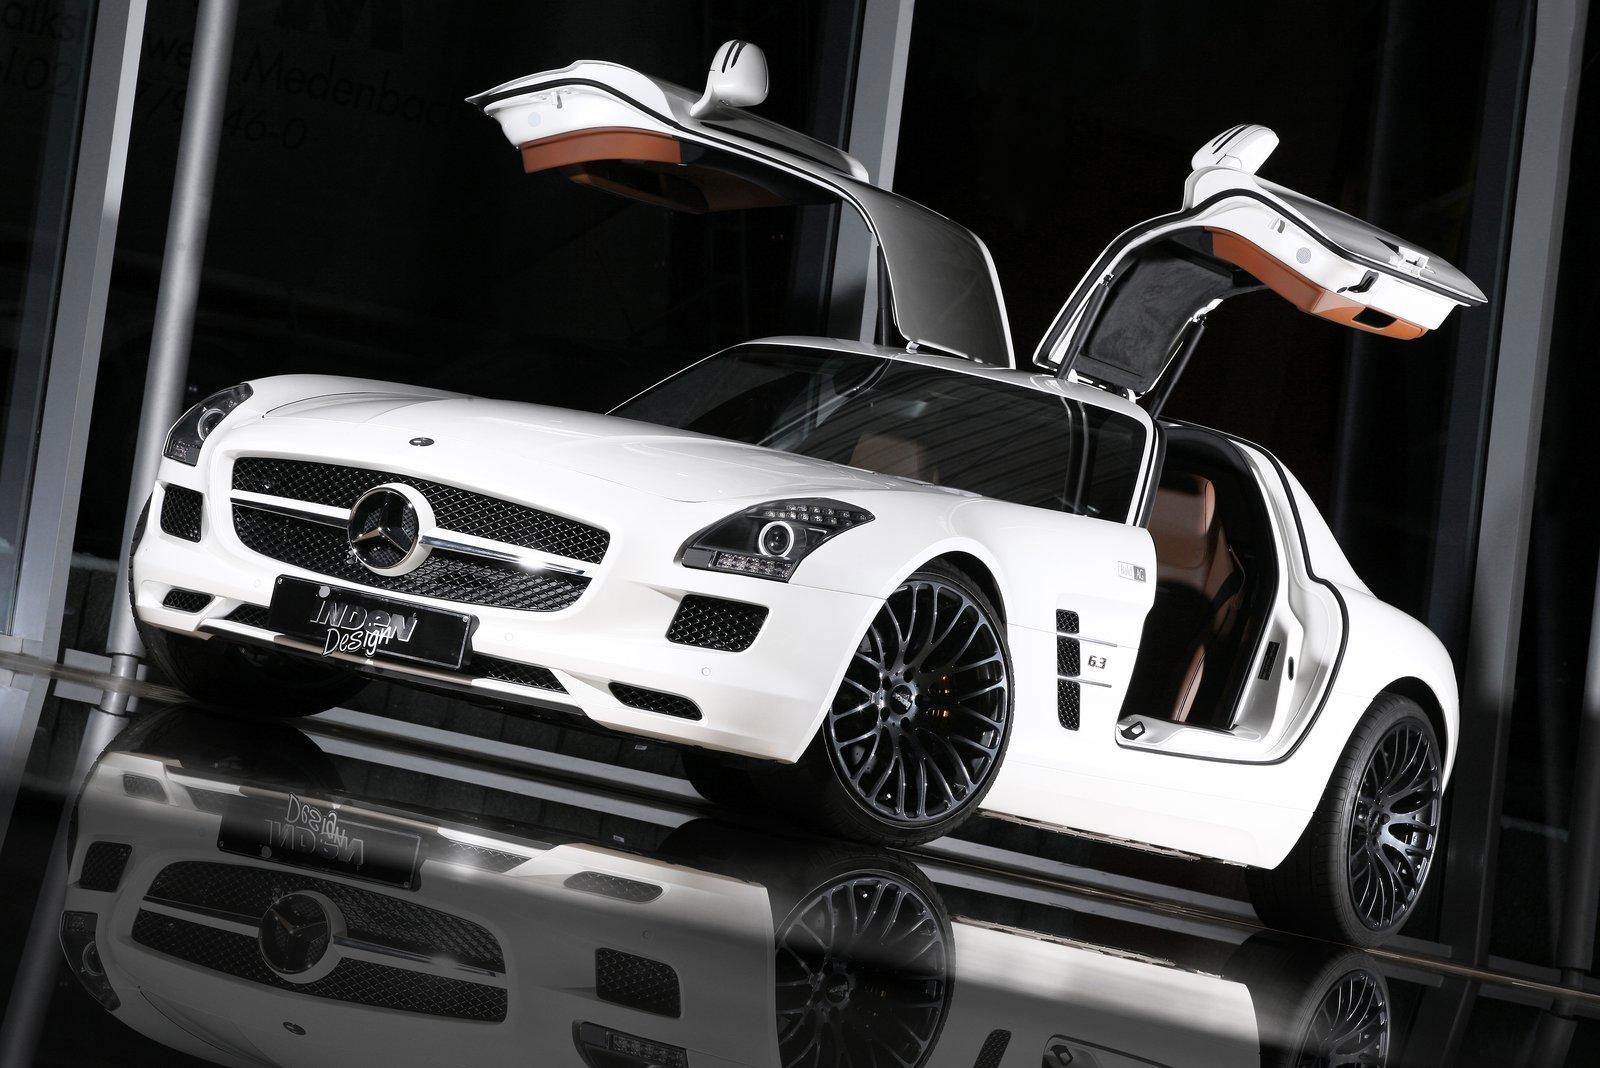 Mercedes-Benz SLS AMG dostal od Inden Design pár koní navíc 2